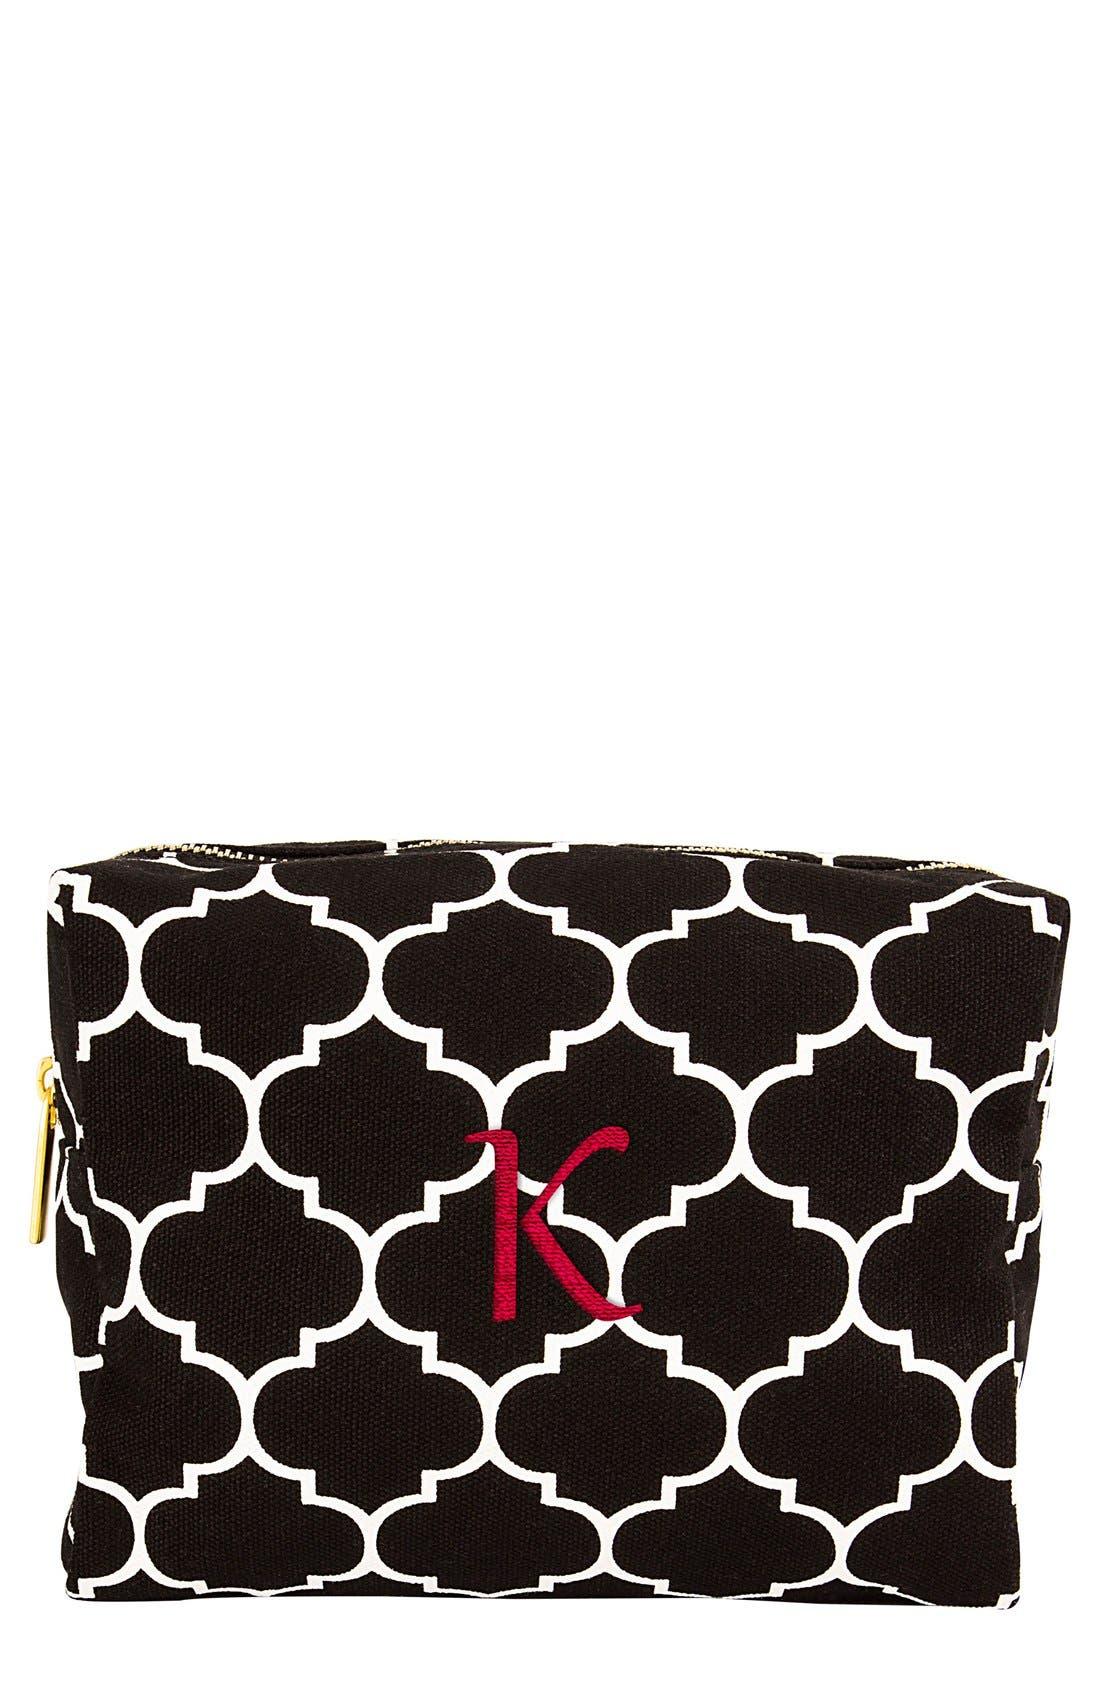 Monogram Cosmetics Bag,                             Main thumbnail 1, color,                             Black-K